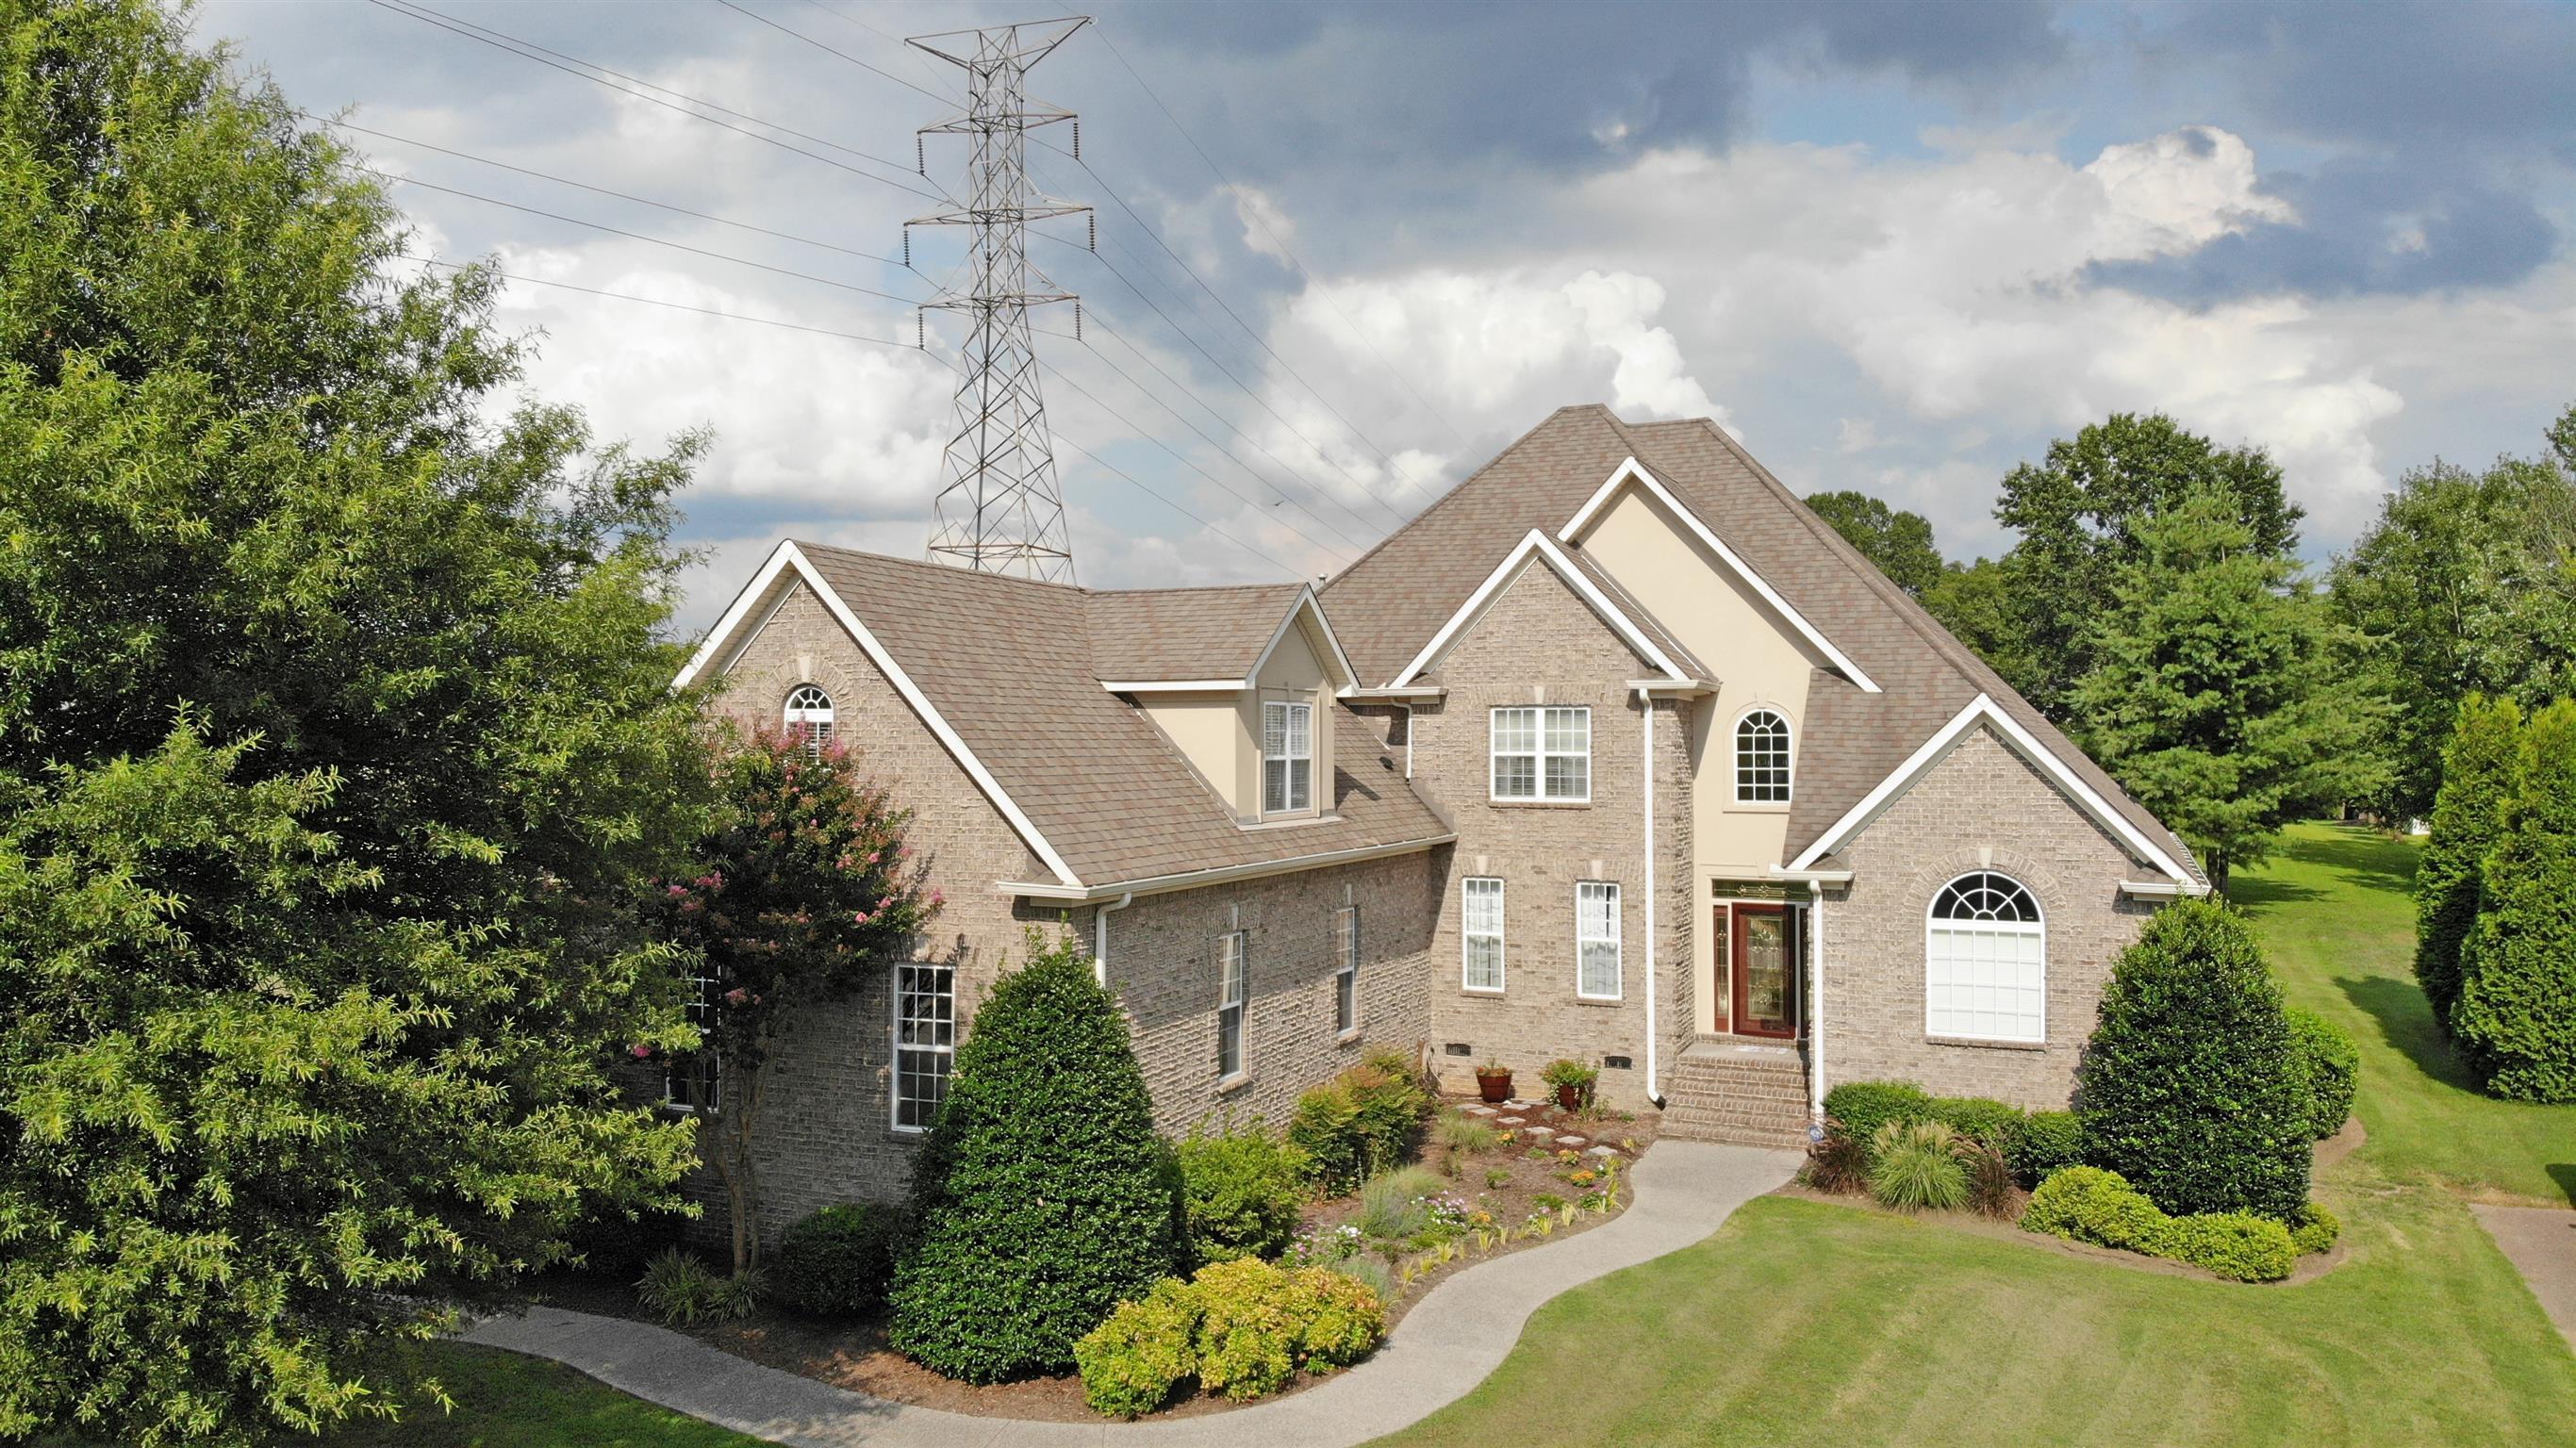 996 Grassland Chase Dr, Gallatin, TN 37066 - Gallatin, TN real estate listing